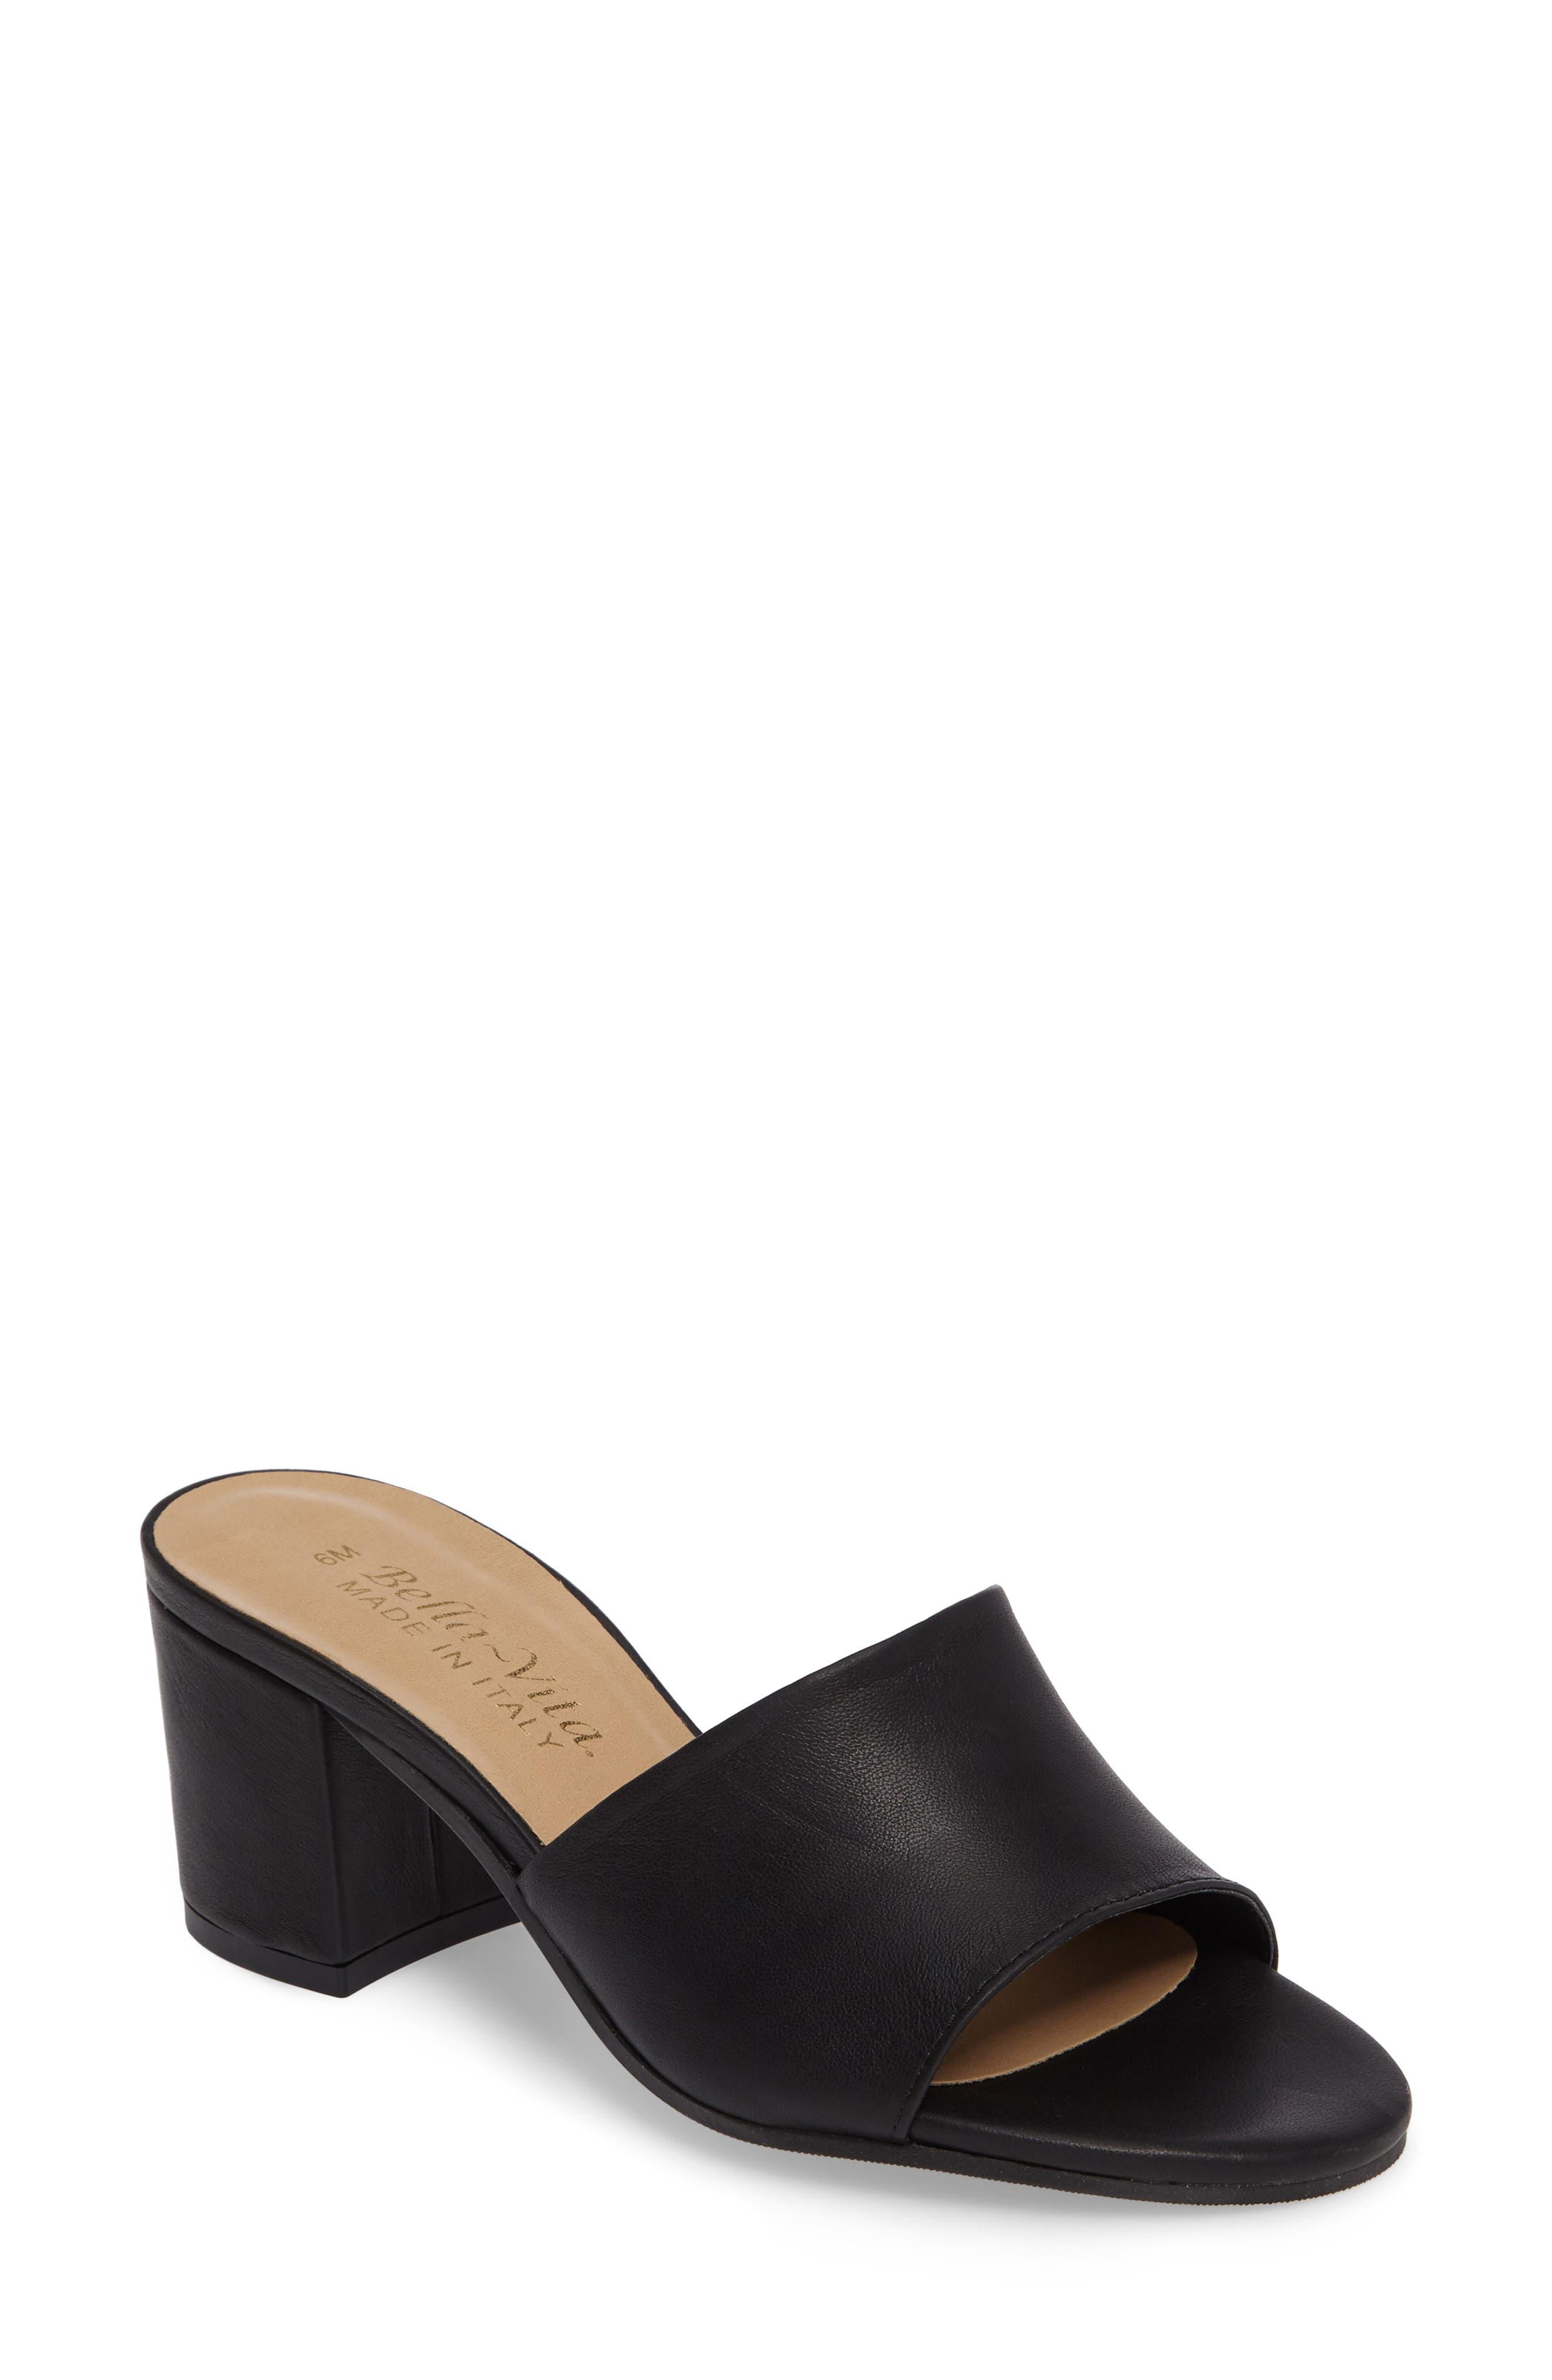 BELLA VITA Mel Slide Sandal, Main, color, 001